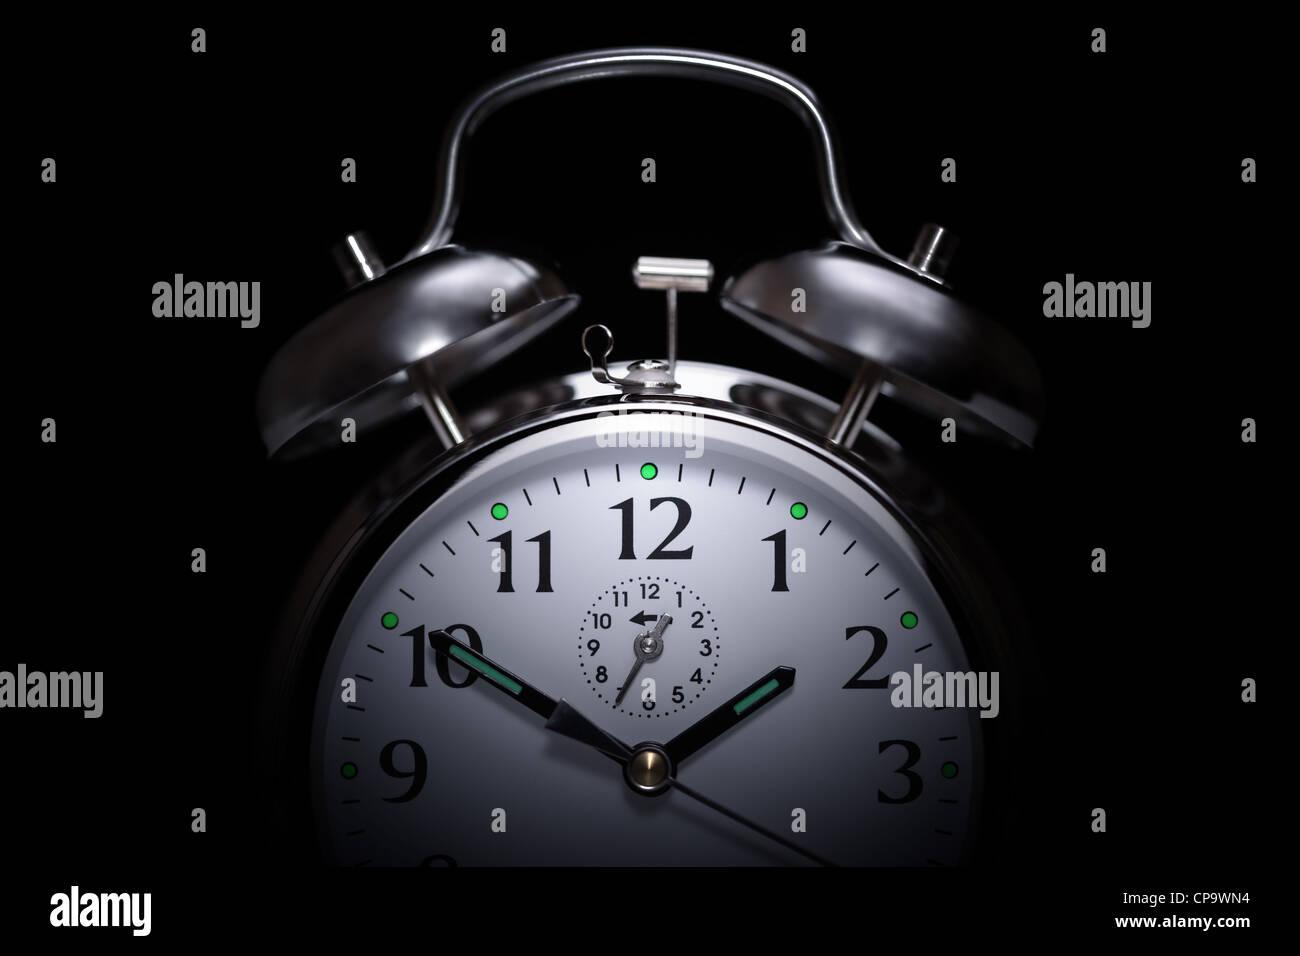 Reloj alarma insomnio Imagen De Stock